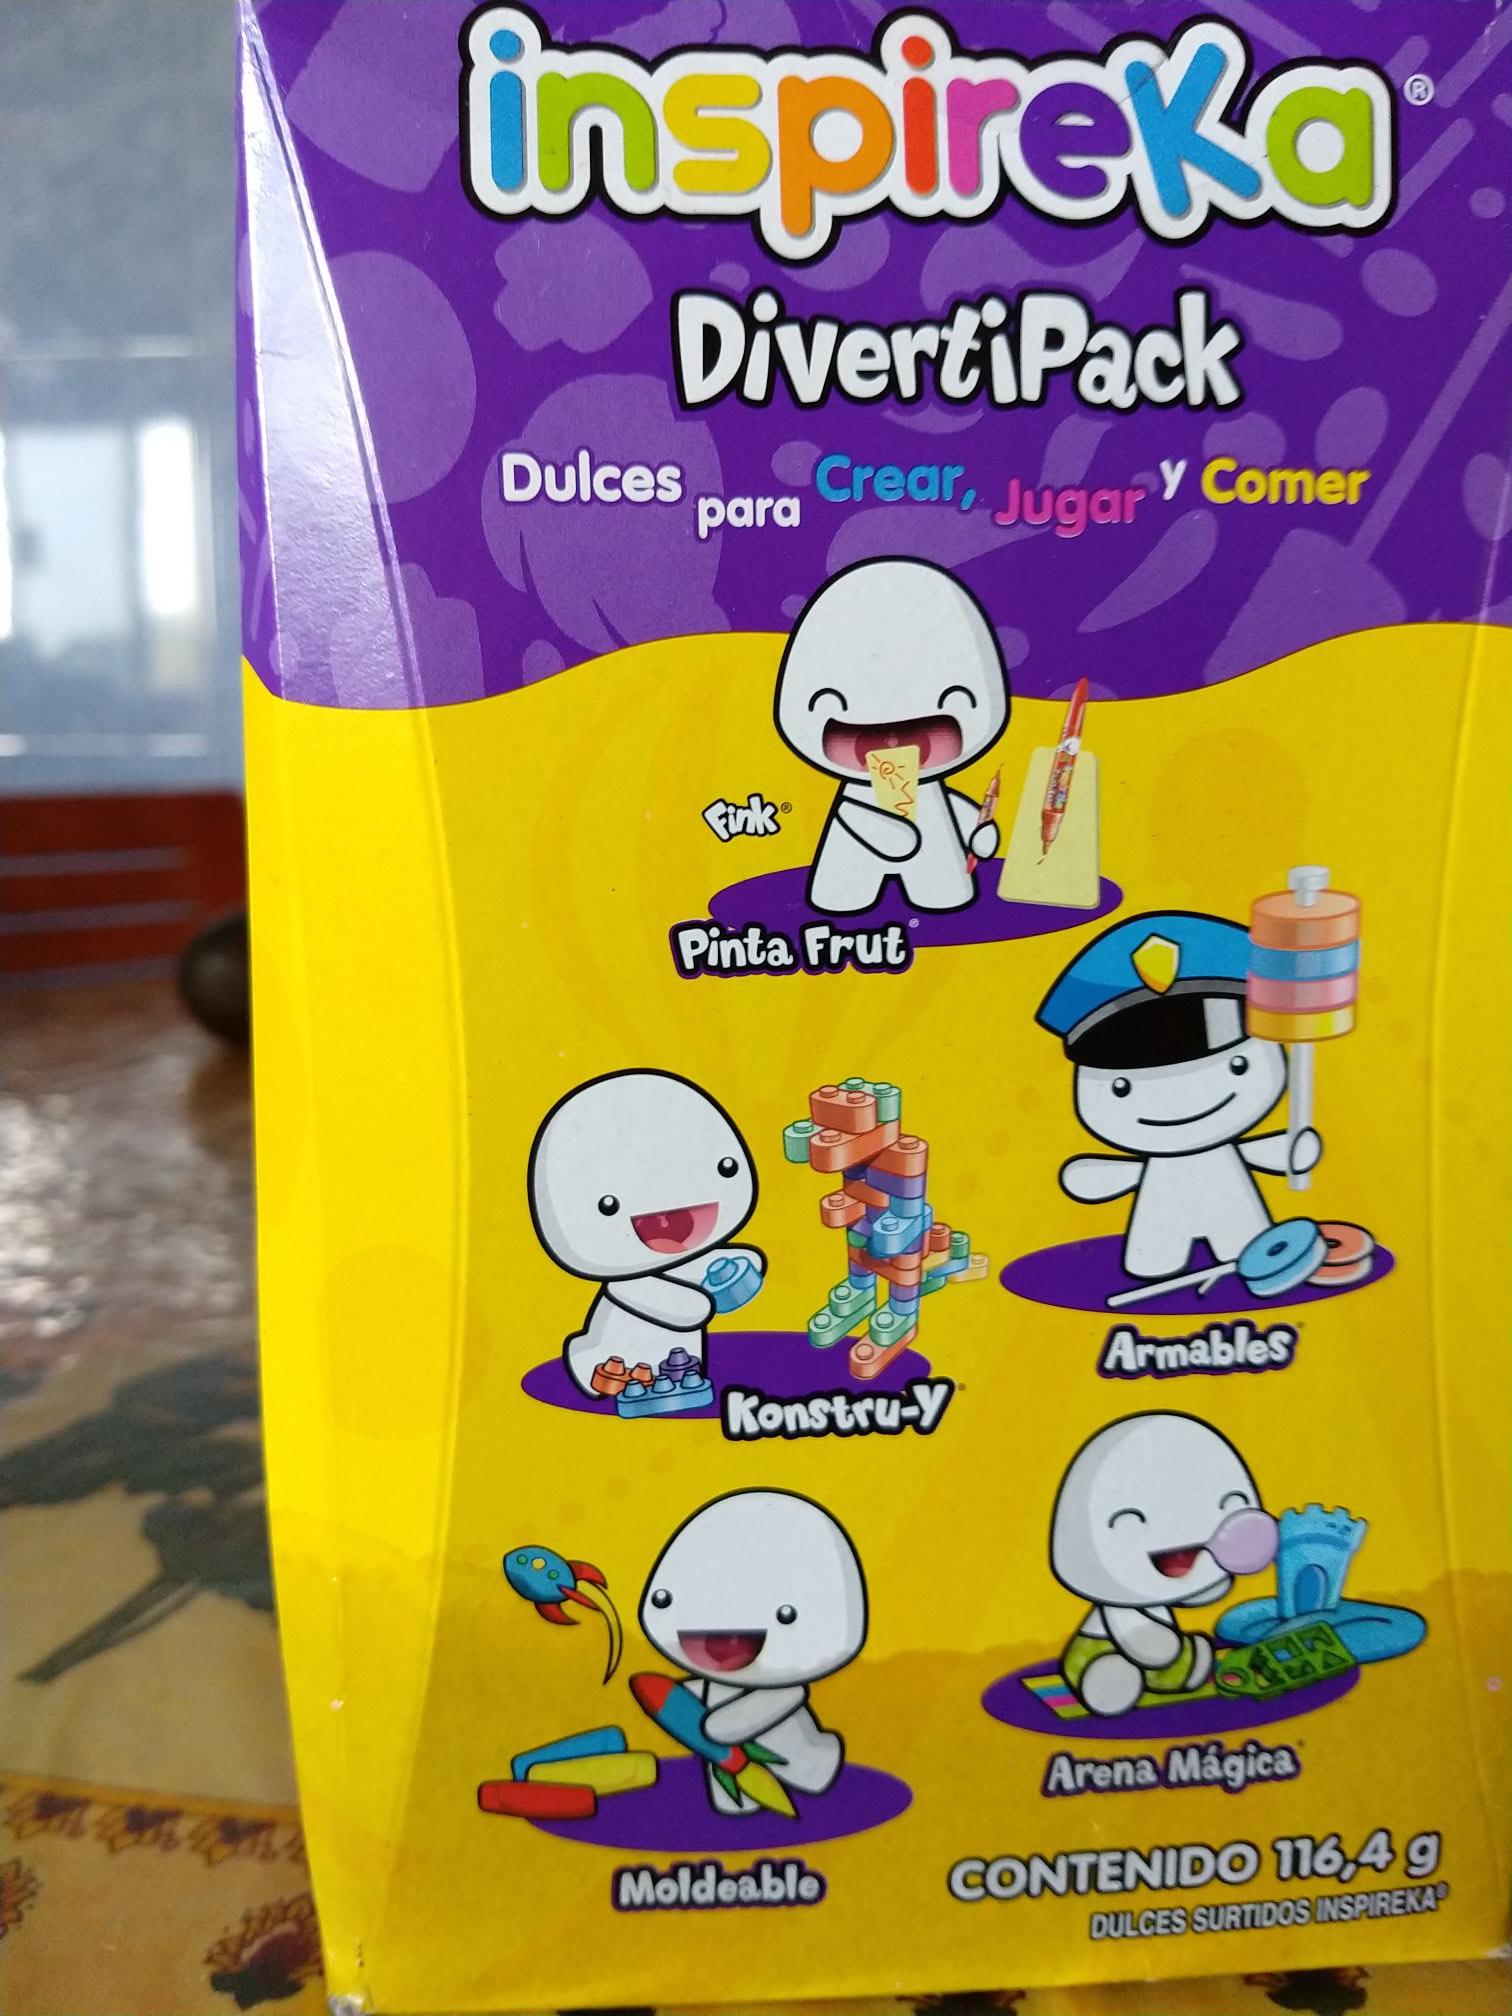 Superama Unidad Loreto Inspireka Diverti Pack en $9.80